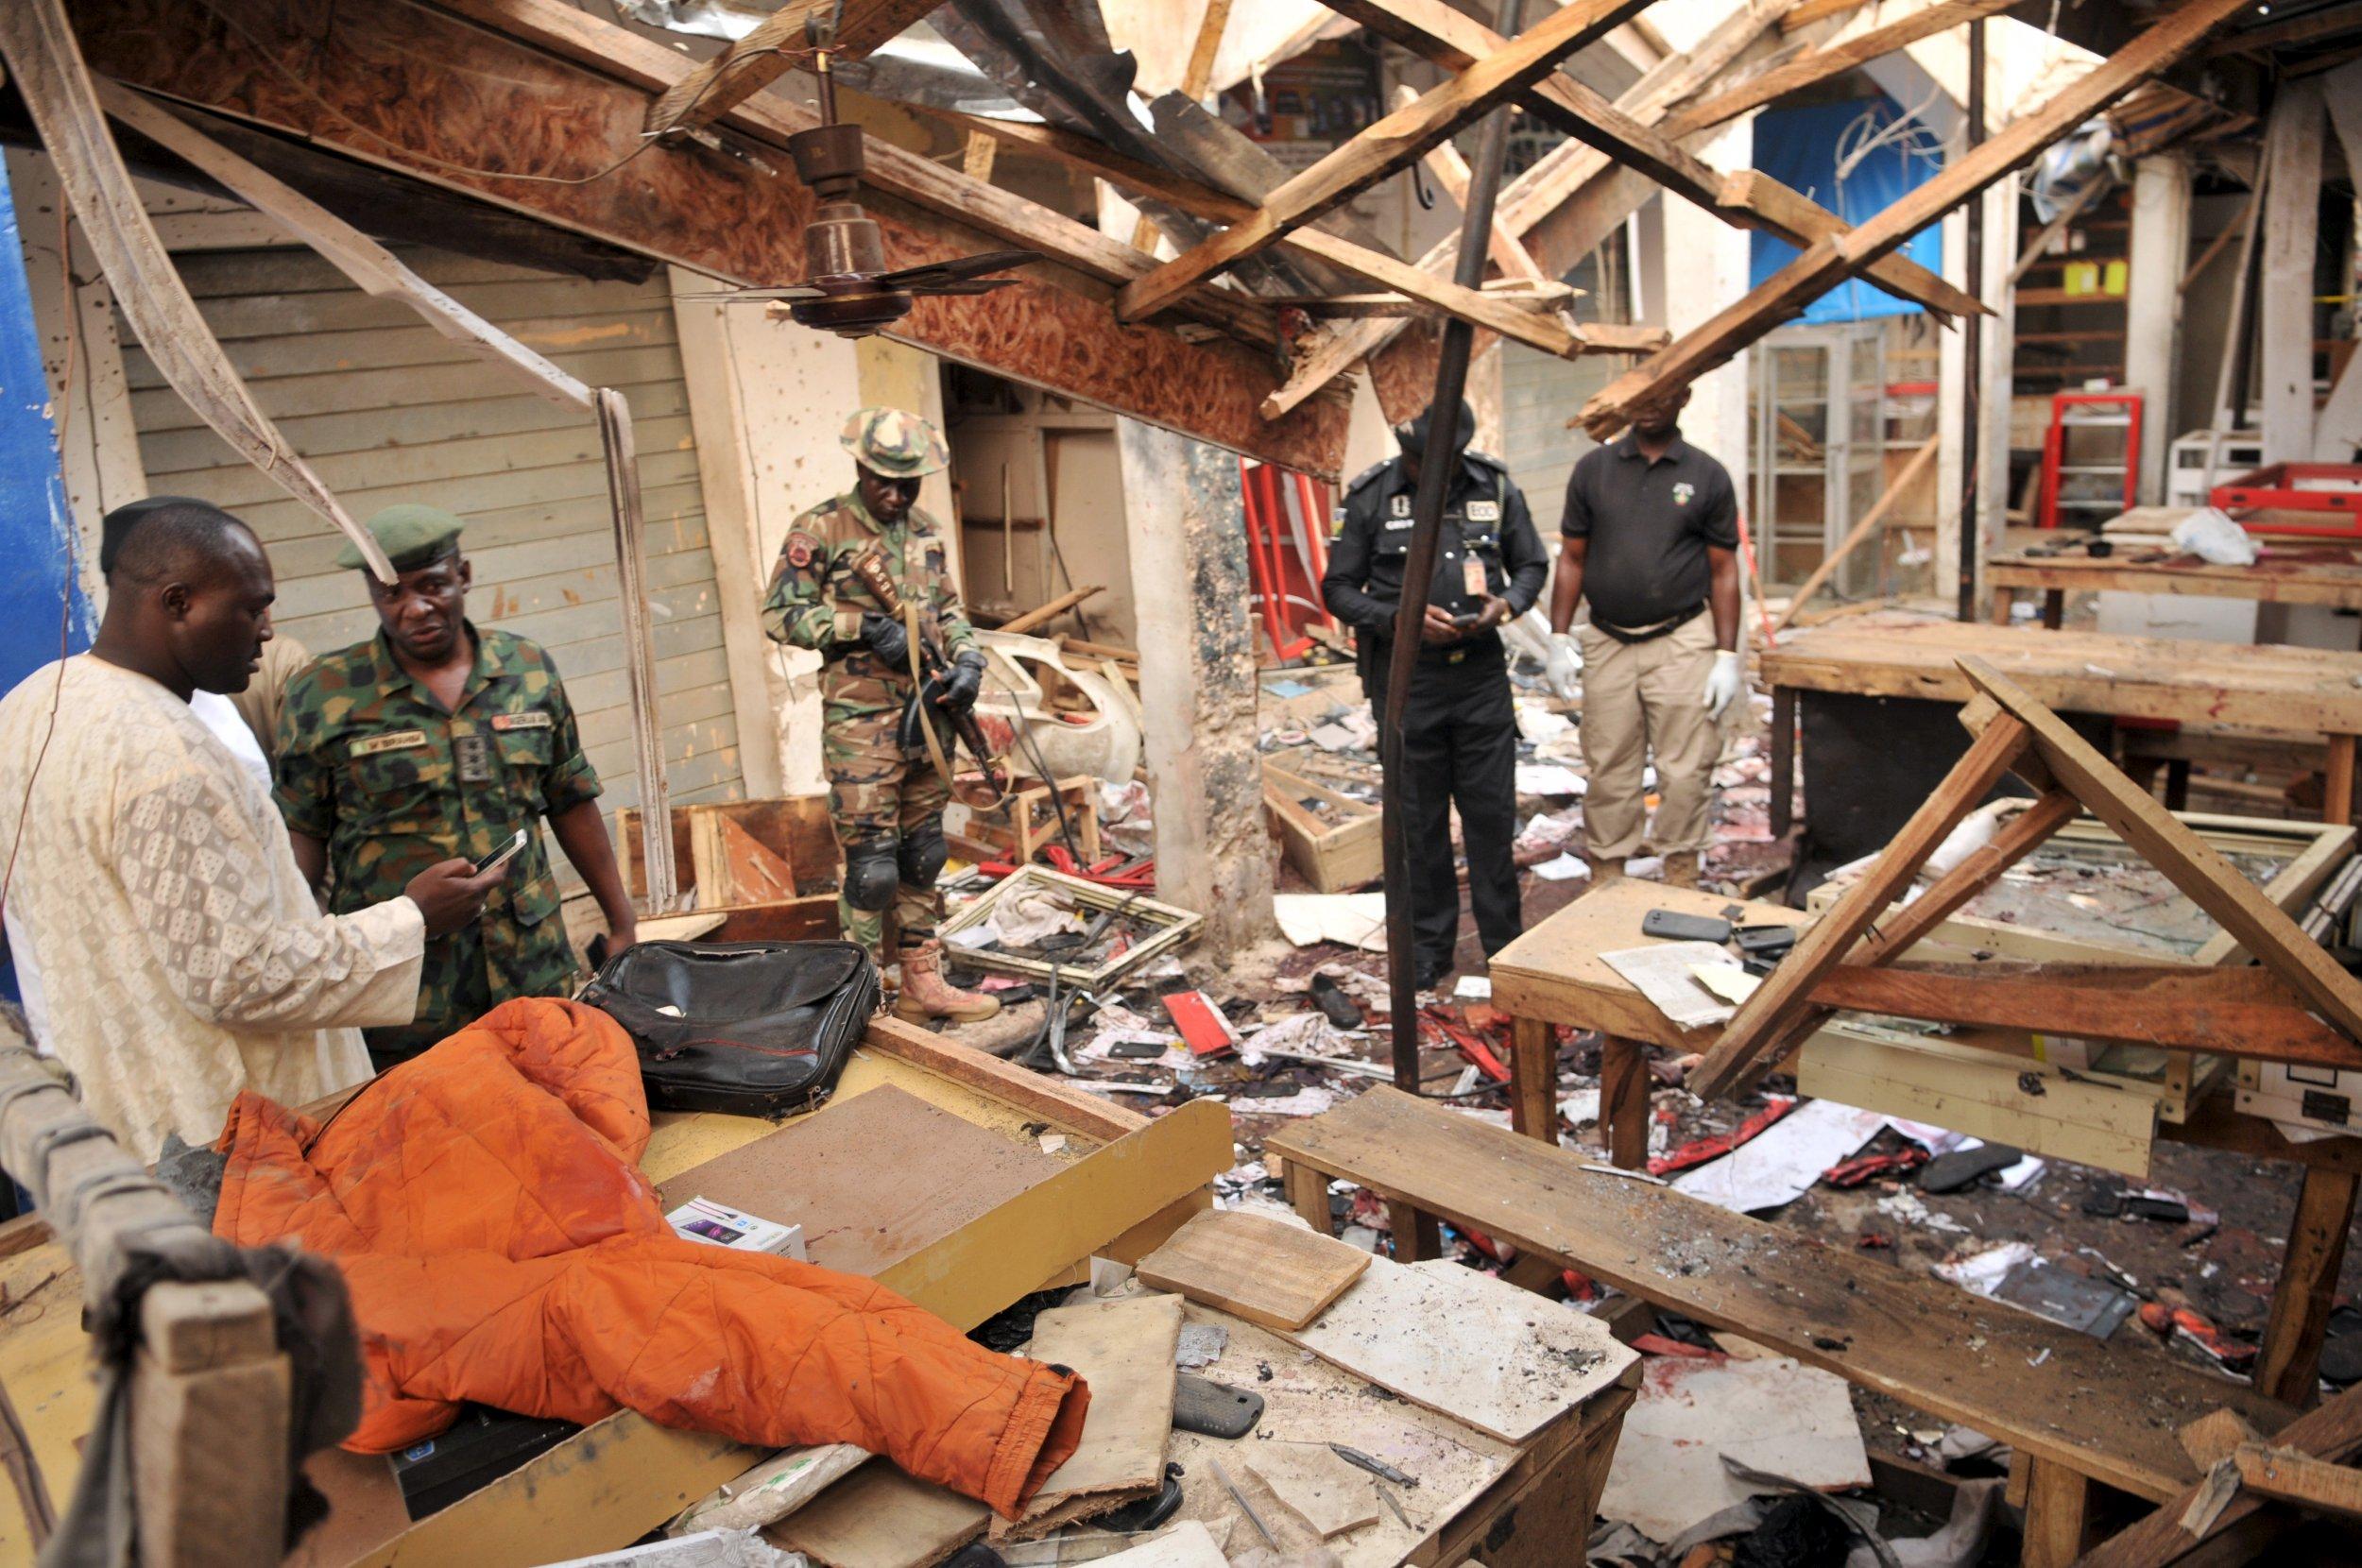 Boko Haram Nigeria Soldiers Middle East